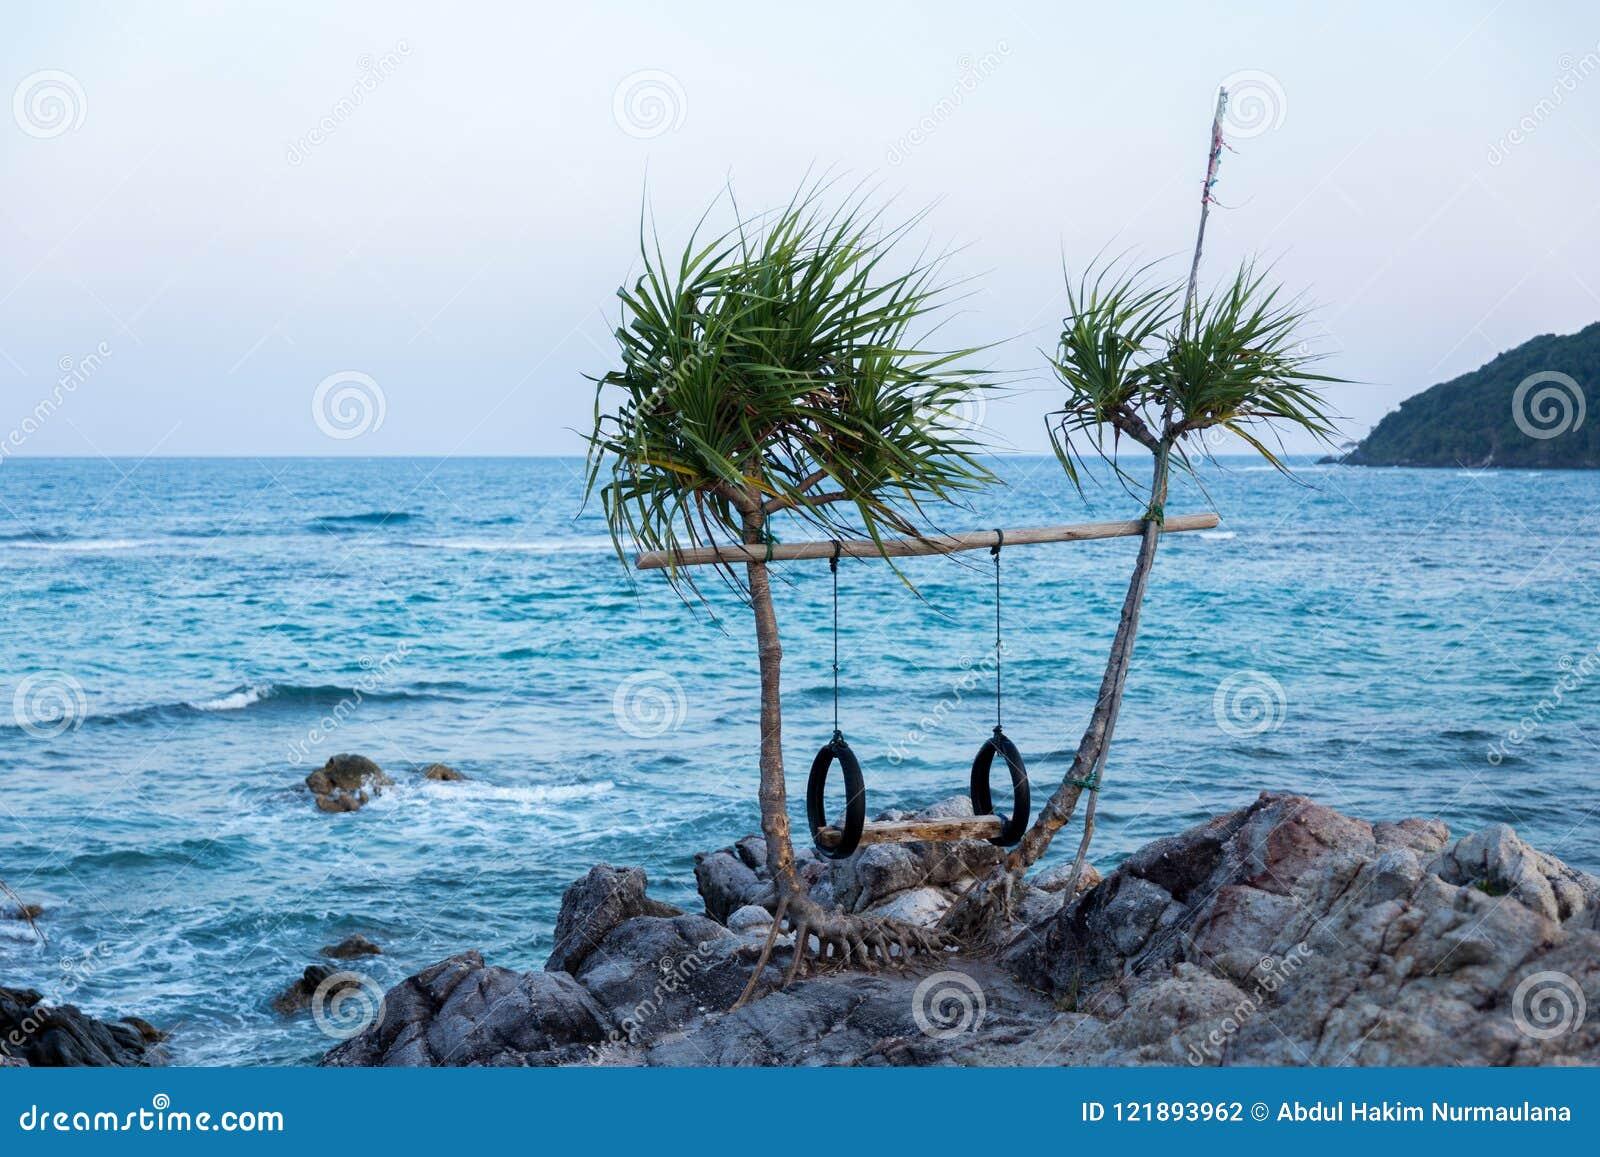 Annora Beach Karimun Jawa Stock Photo Image Of Foreground 121893962